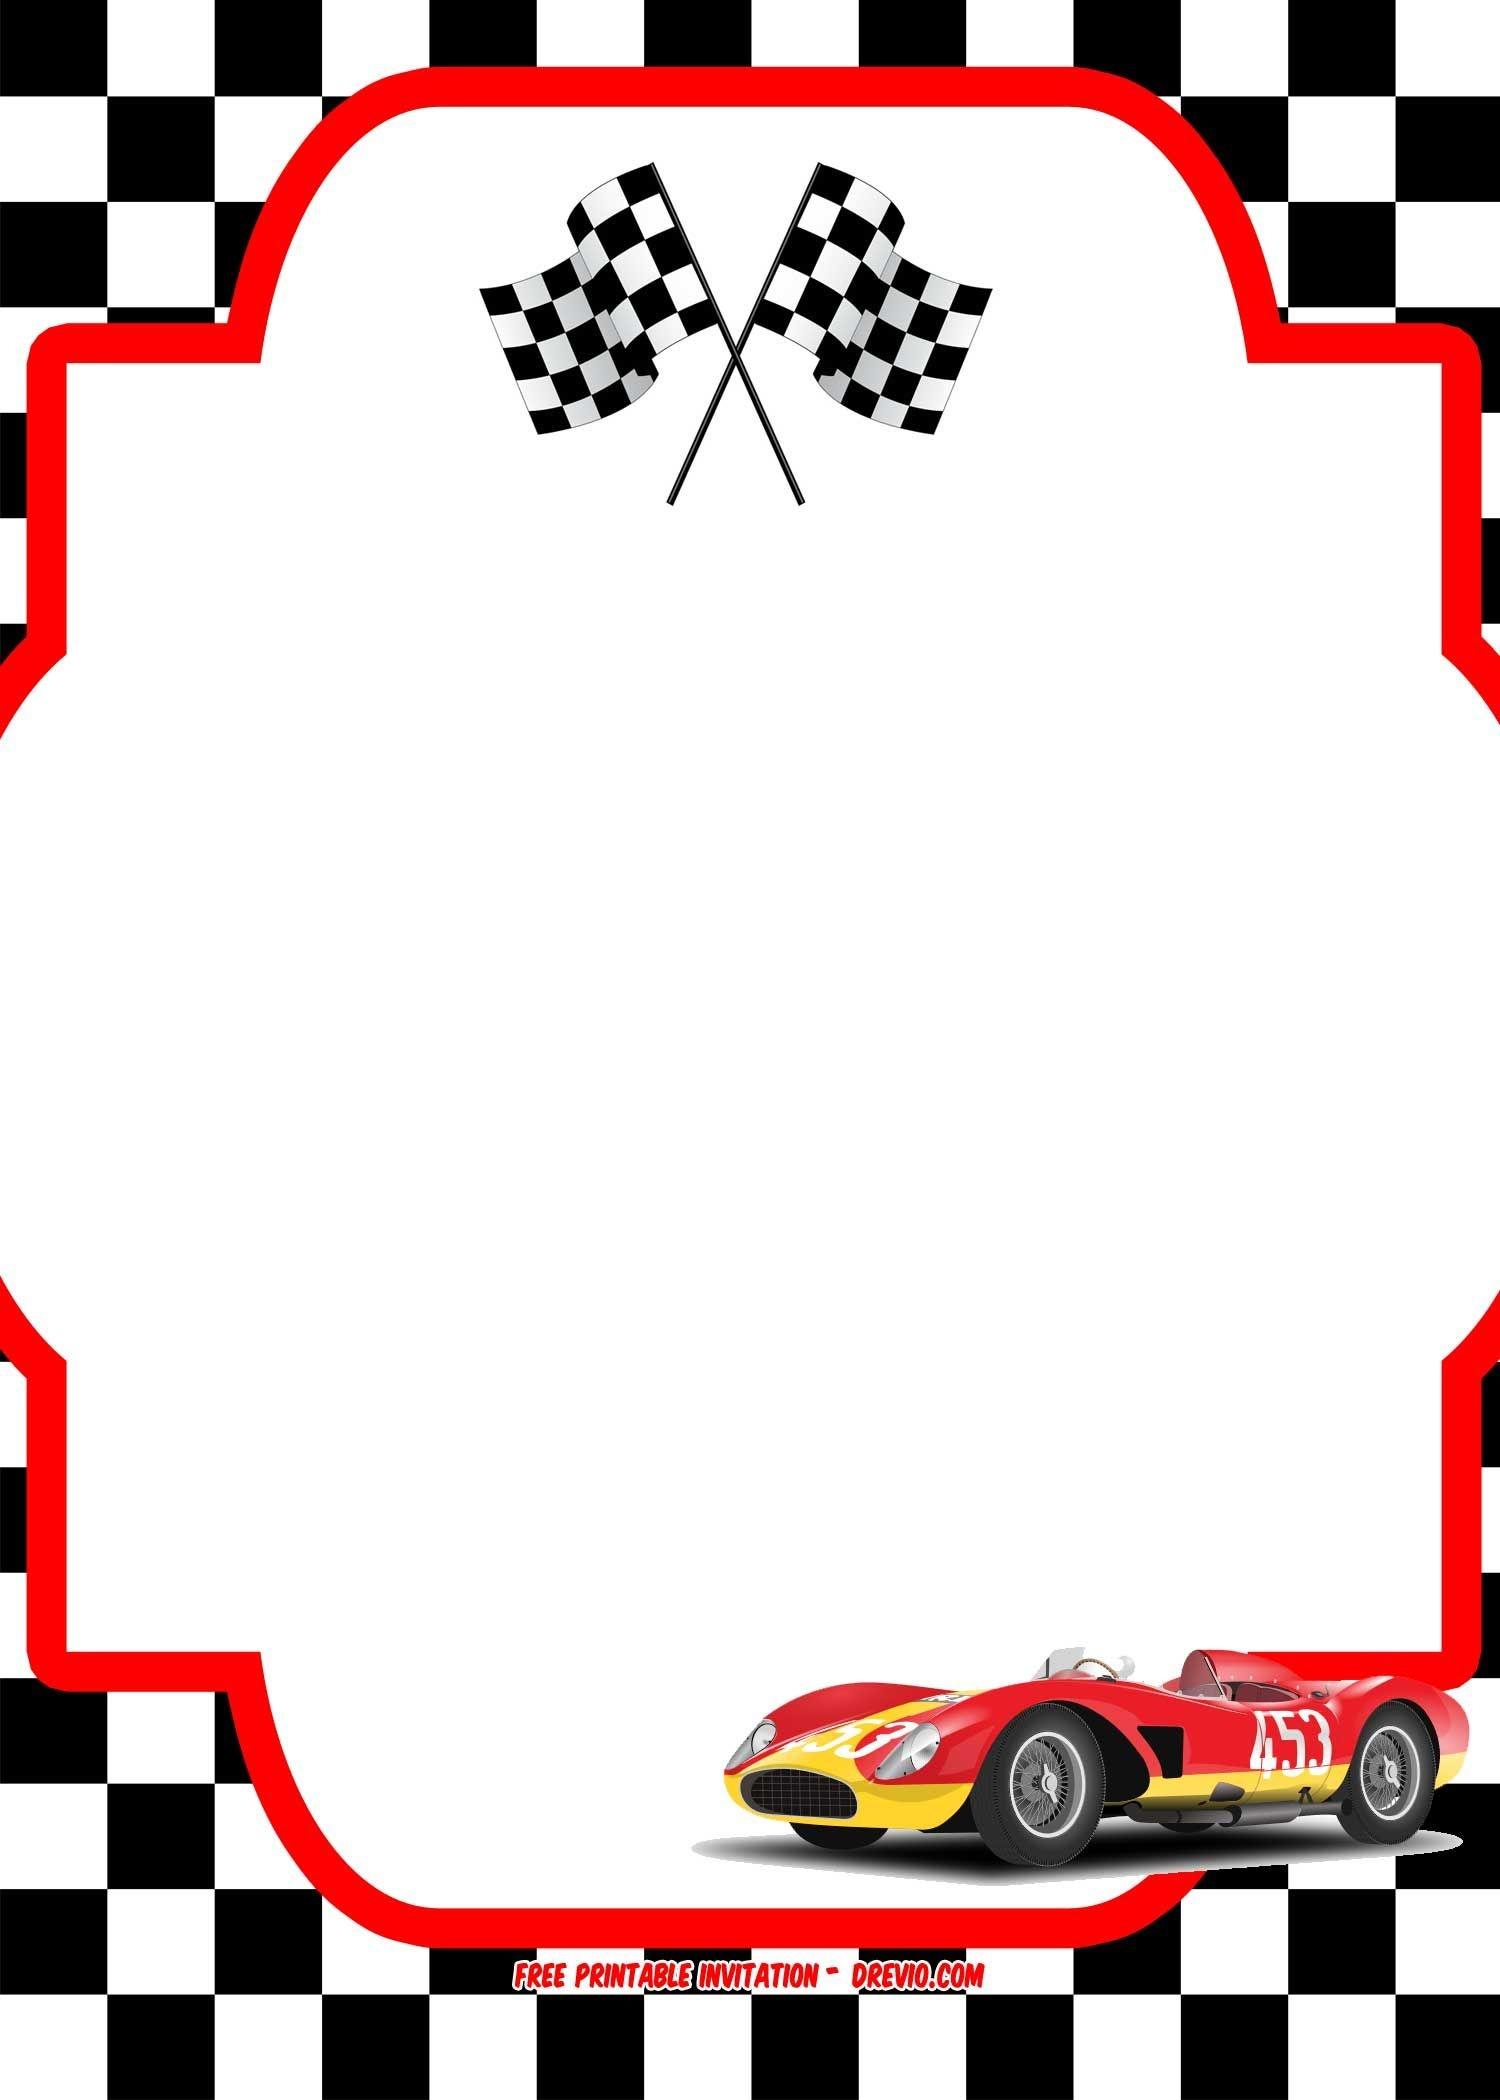 Free Race Car Birthday Invitation Template - Printable   Free - Free Printable Birthday Invitations Cars Theme